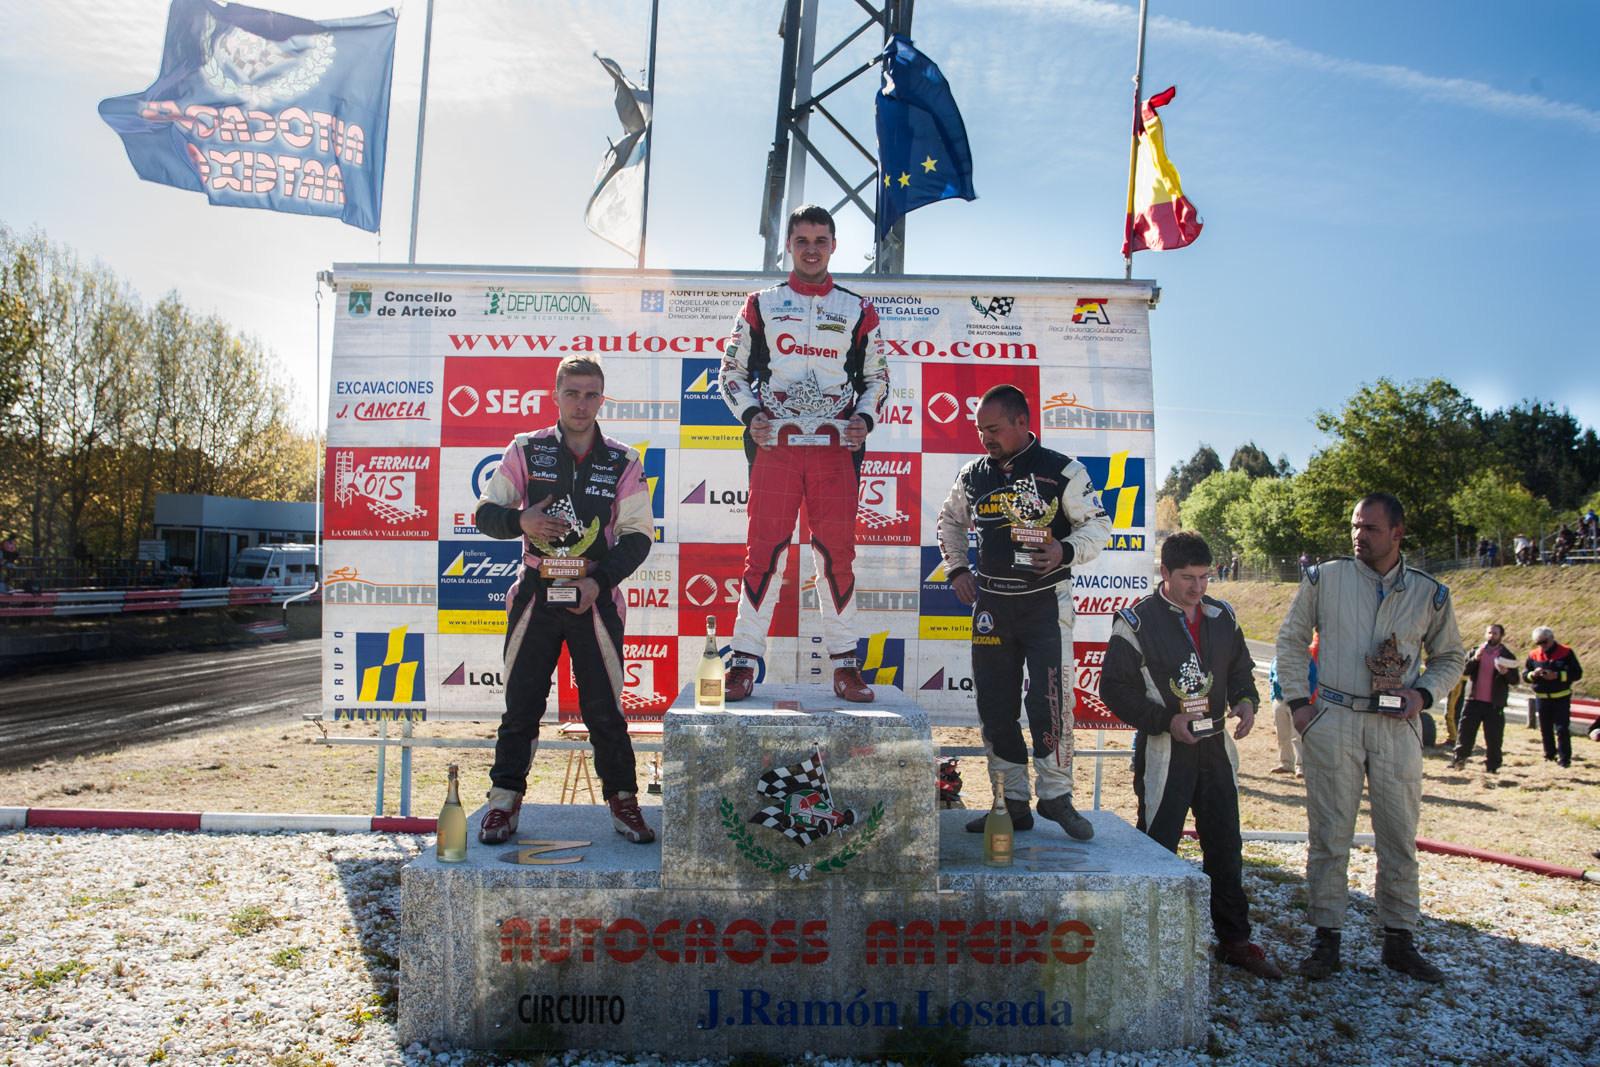 003 Autocross Arteixo FGA Abril 2016 043